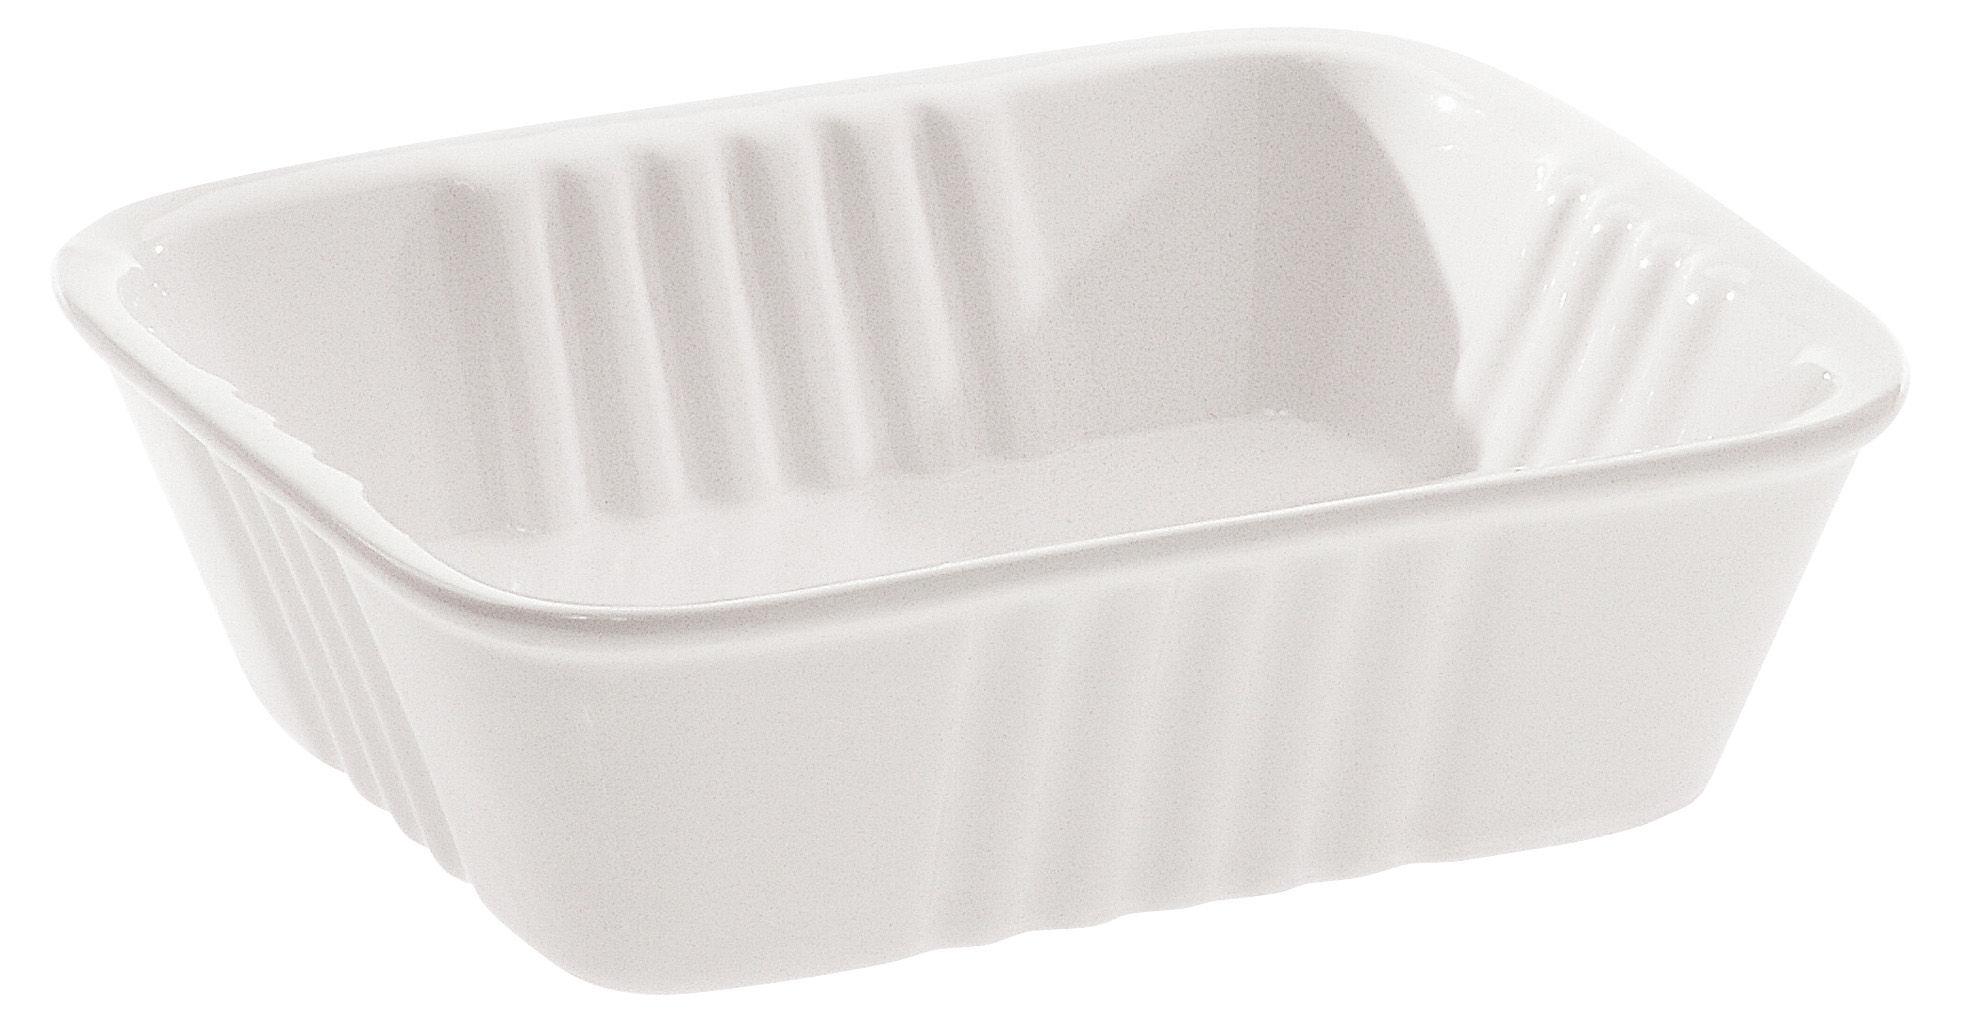 Tischkultur - Platten - Estetico quotidiano Platte 14 x 11 cm - Seletti - Weiß - Teller - Porzellan